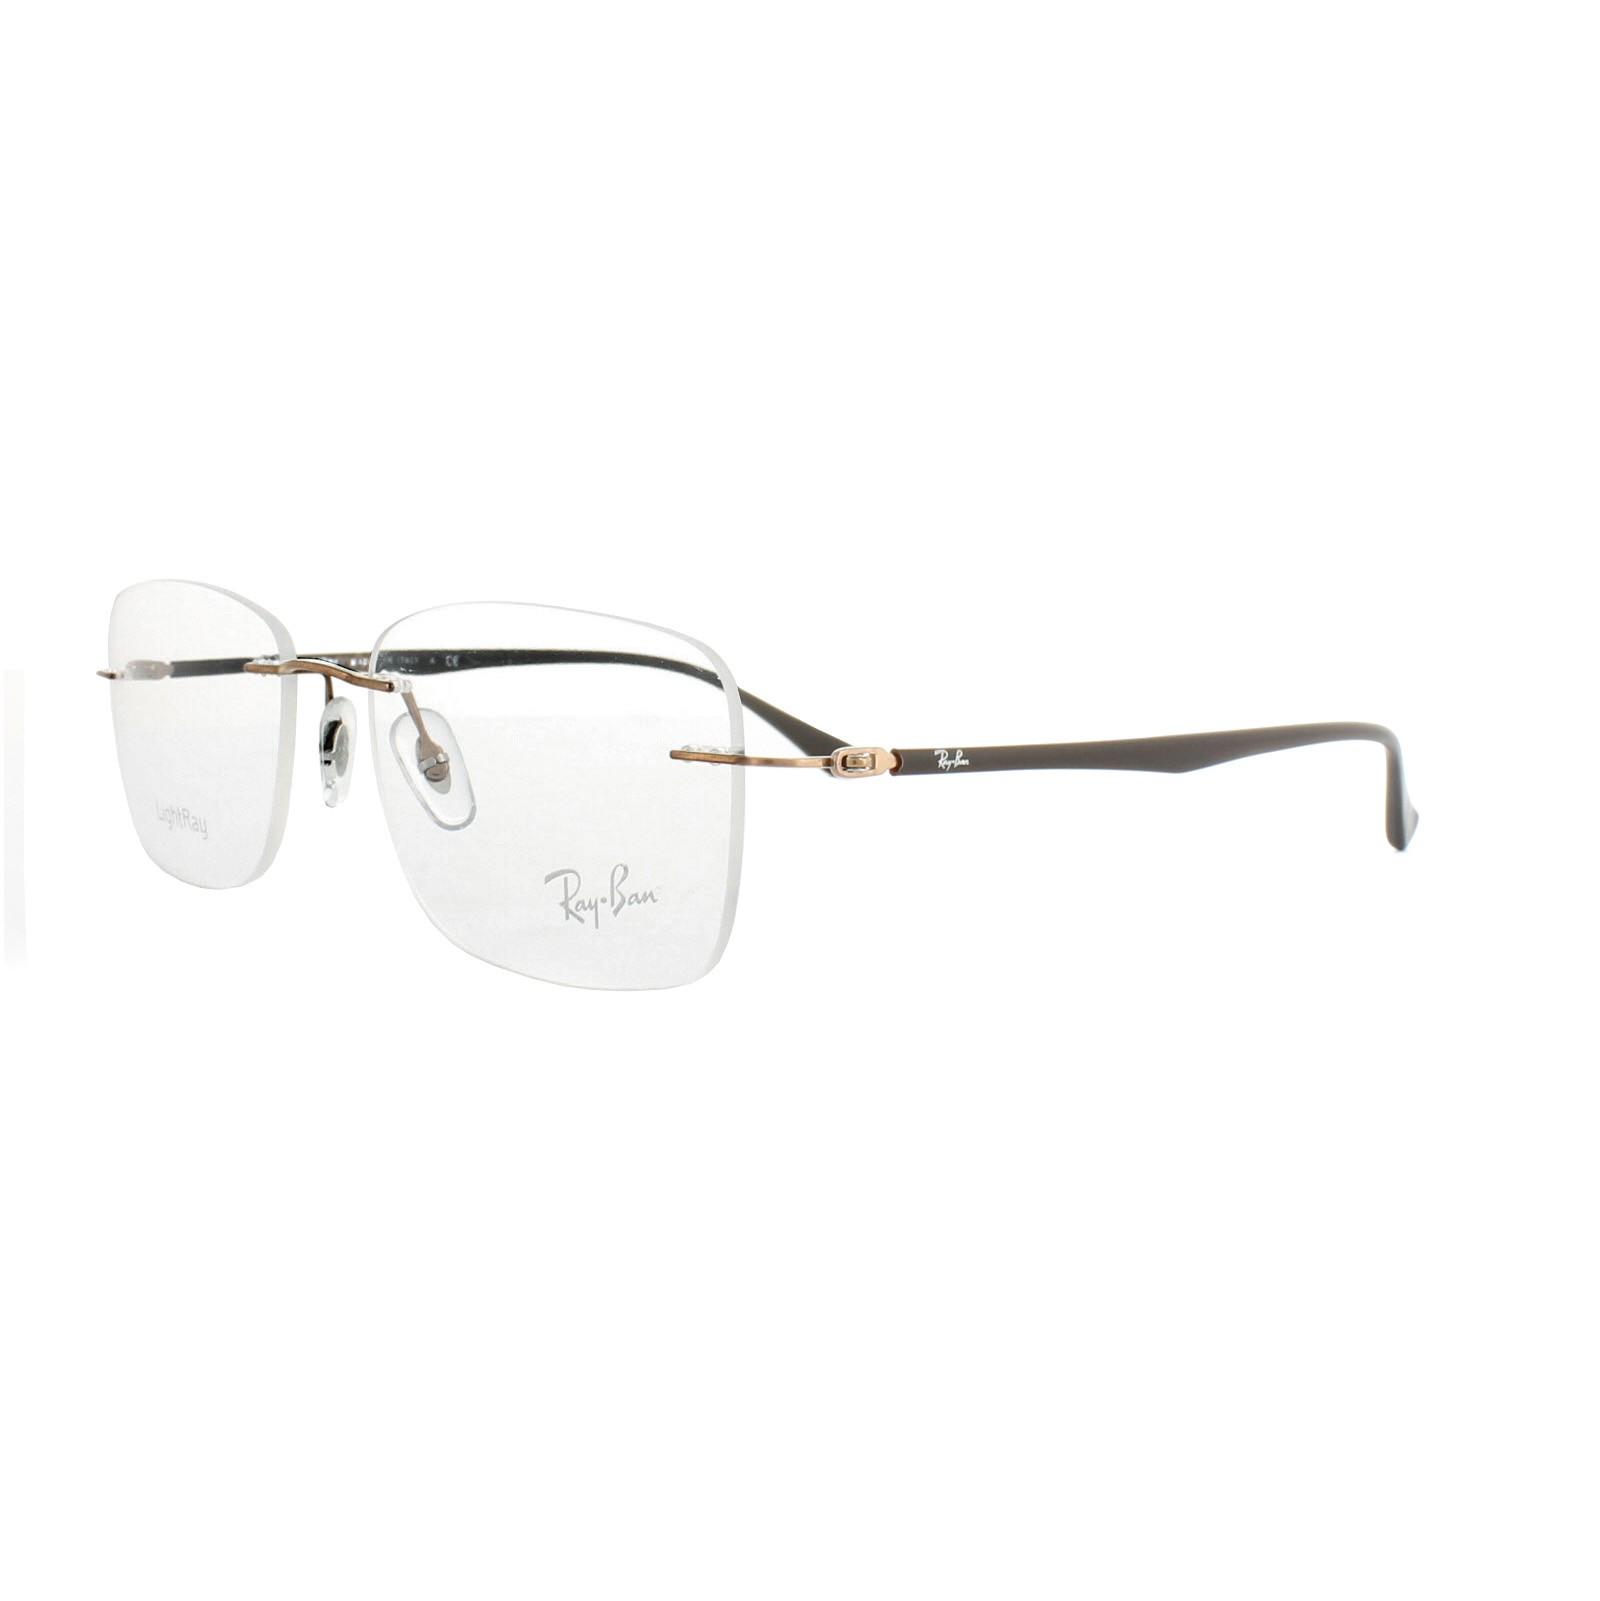 Ray-Ban Glasses Frames RX 8725 1131 Brown Mens 52mm 8053672234640   eBay